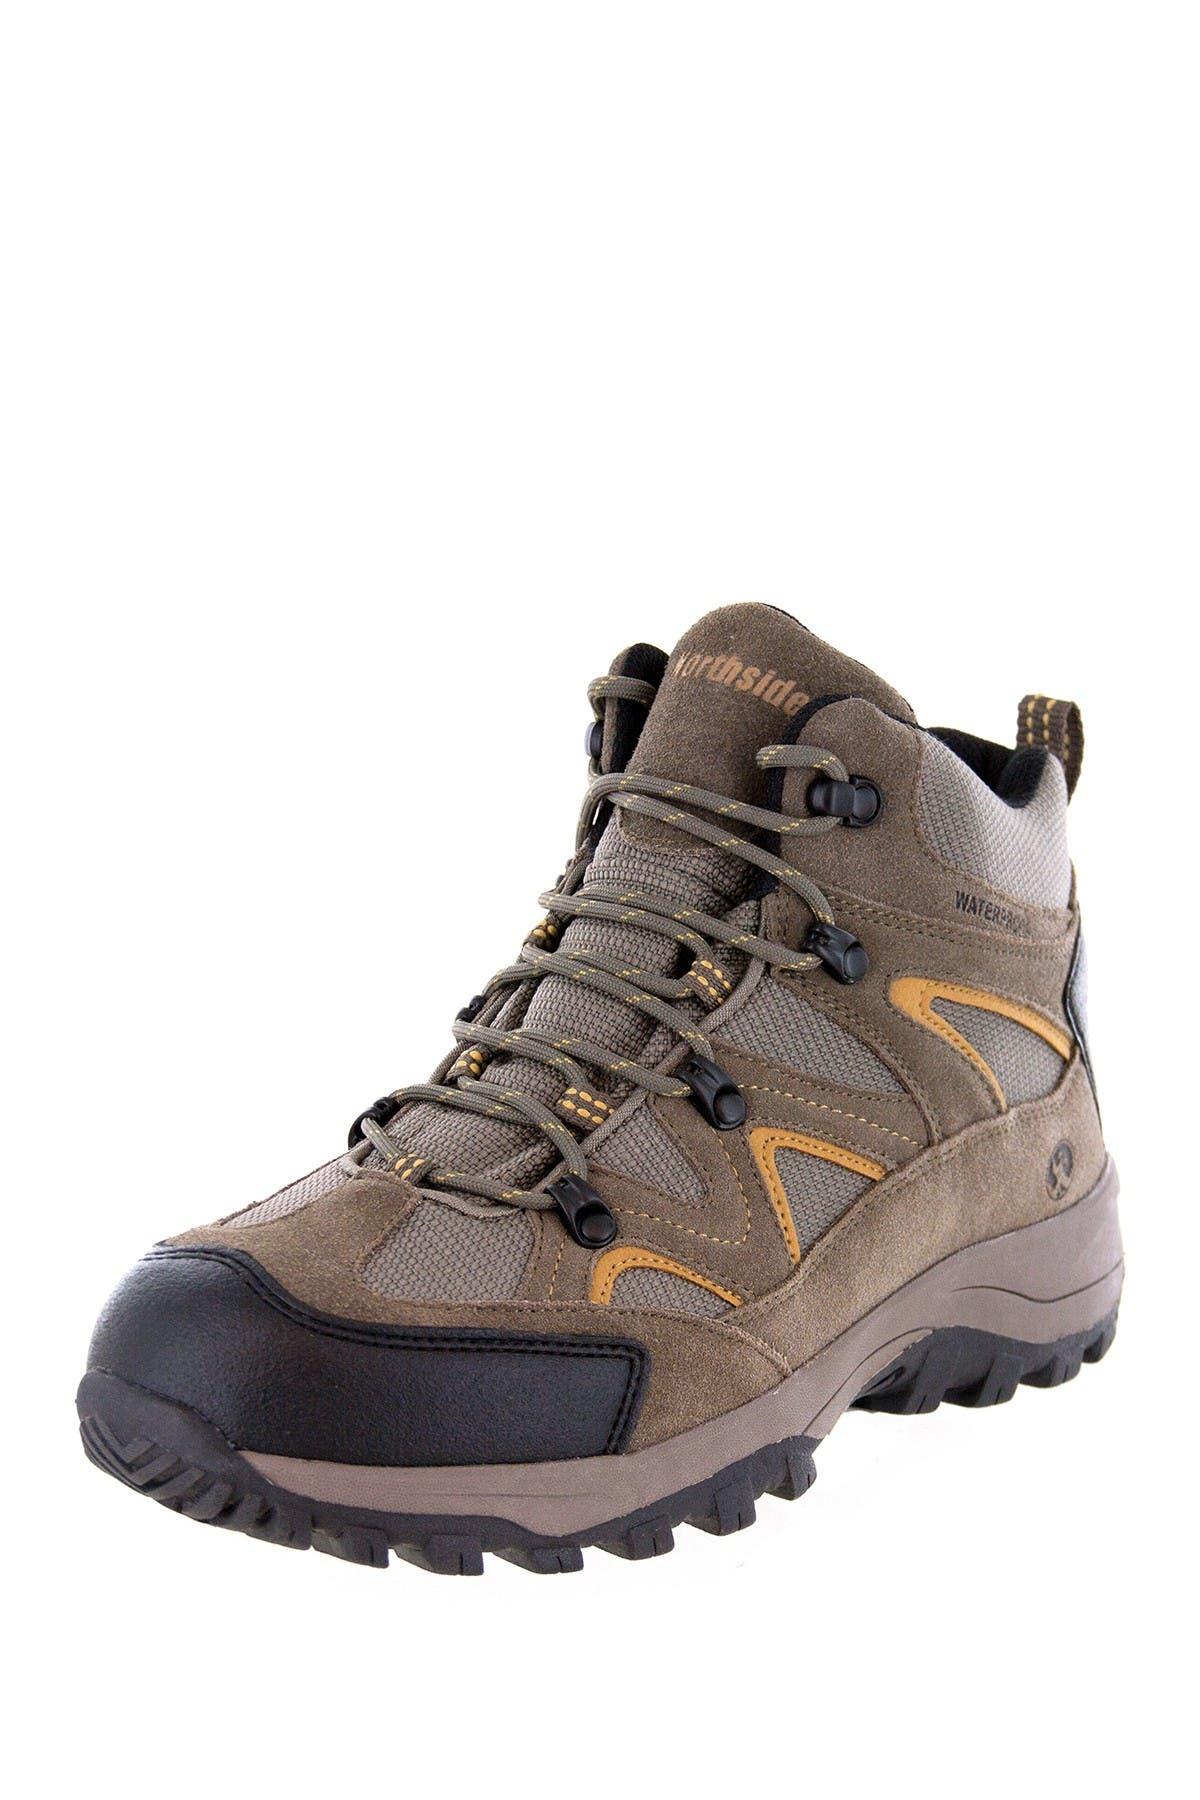 Snohomish Waterproof Suede Hiking Boot